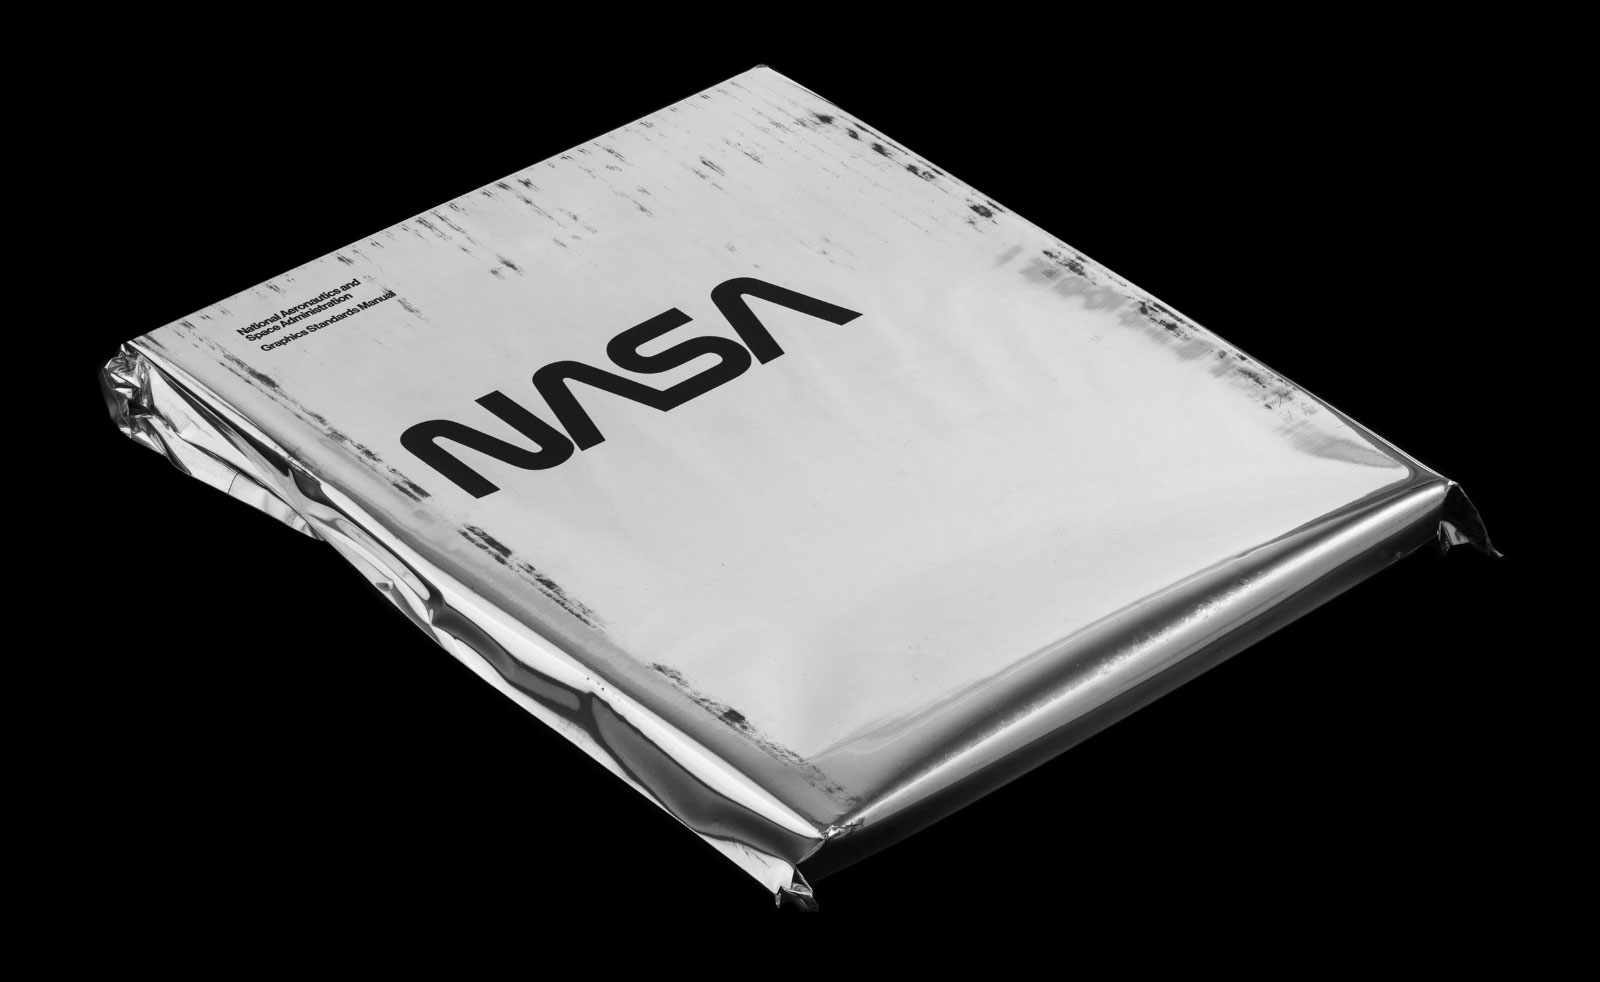 001_NASA-1600.jpg